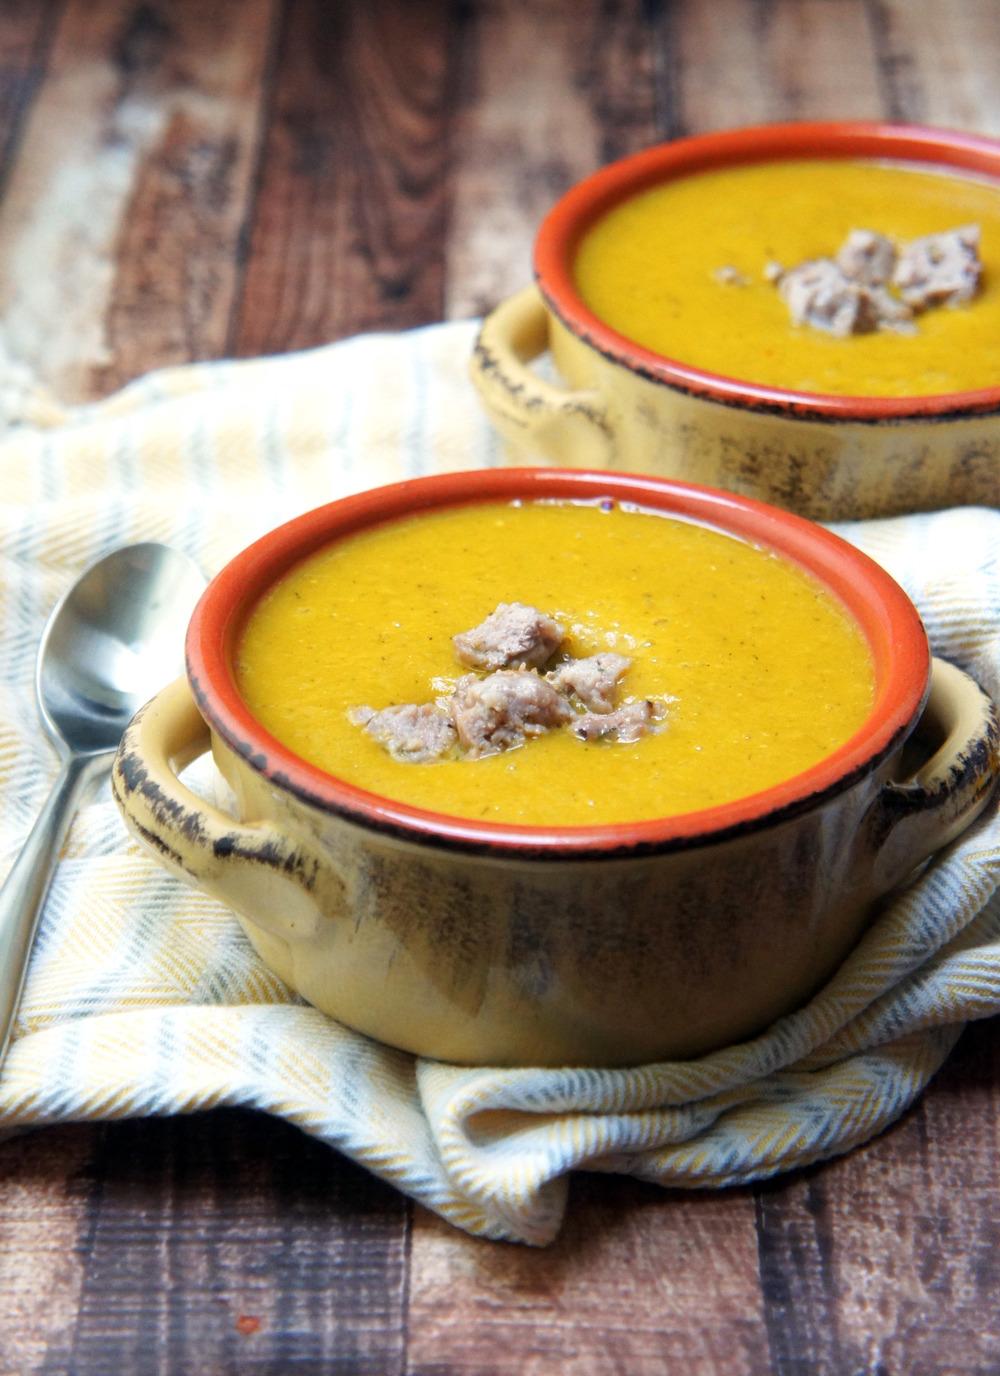 """Squashage"" - A Savory Butternut Squash Soup"